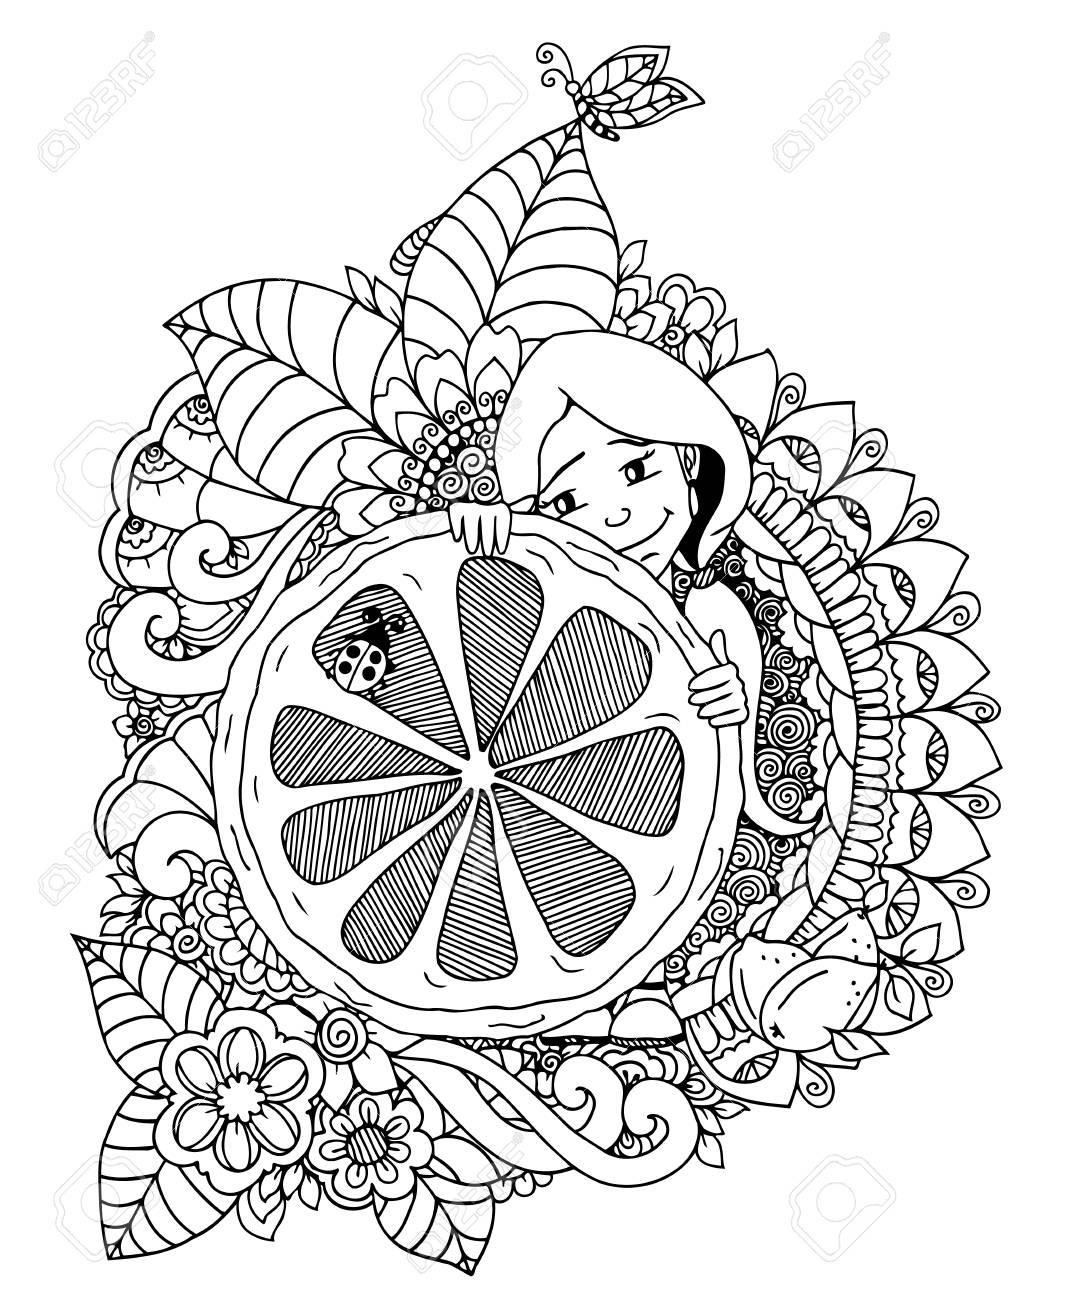 1072x1300 Vector Illustration Zentangl, A Girl Holding A Lemon In